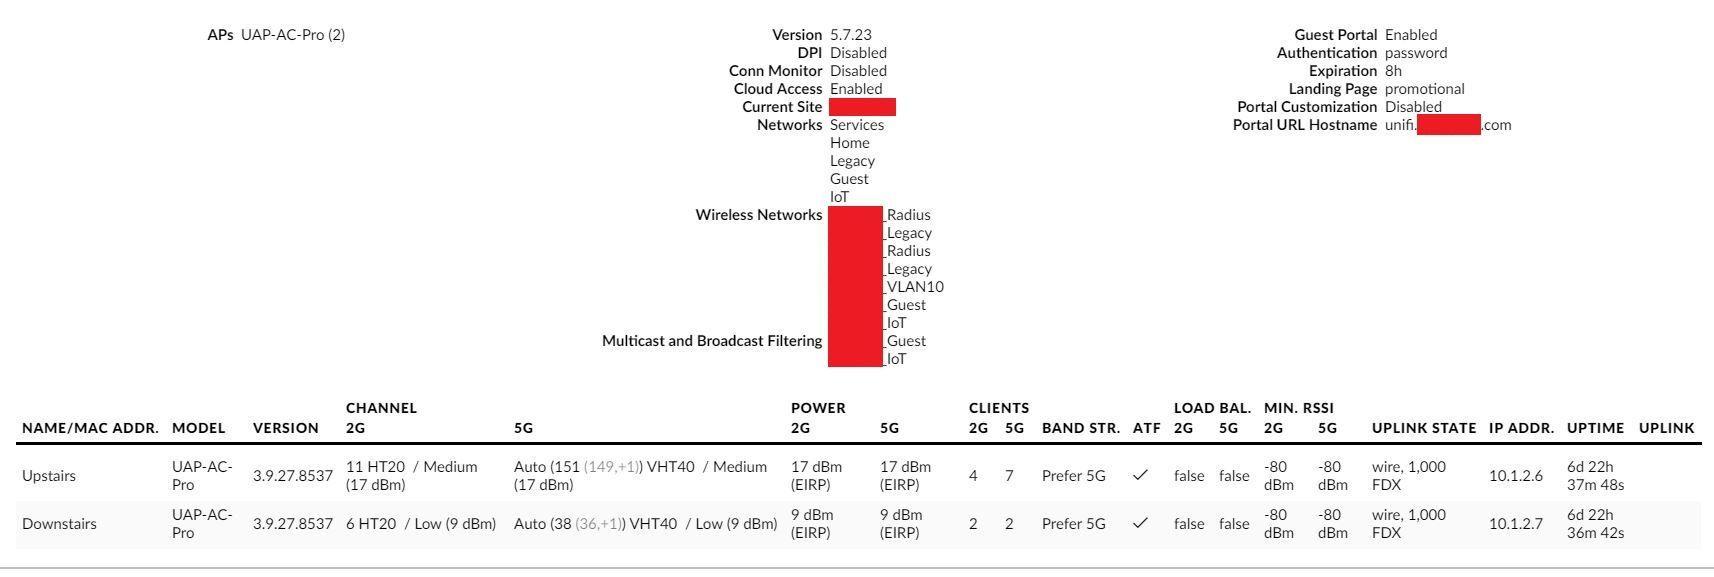 Wifi on Samsung J3 freezes | Ubiquiti Community